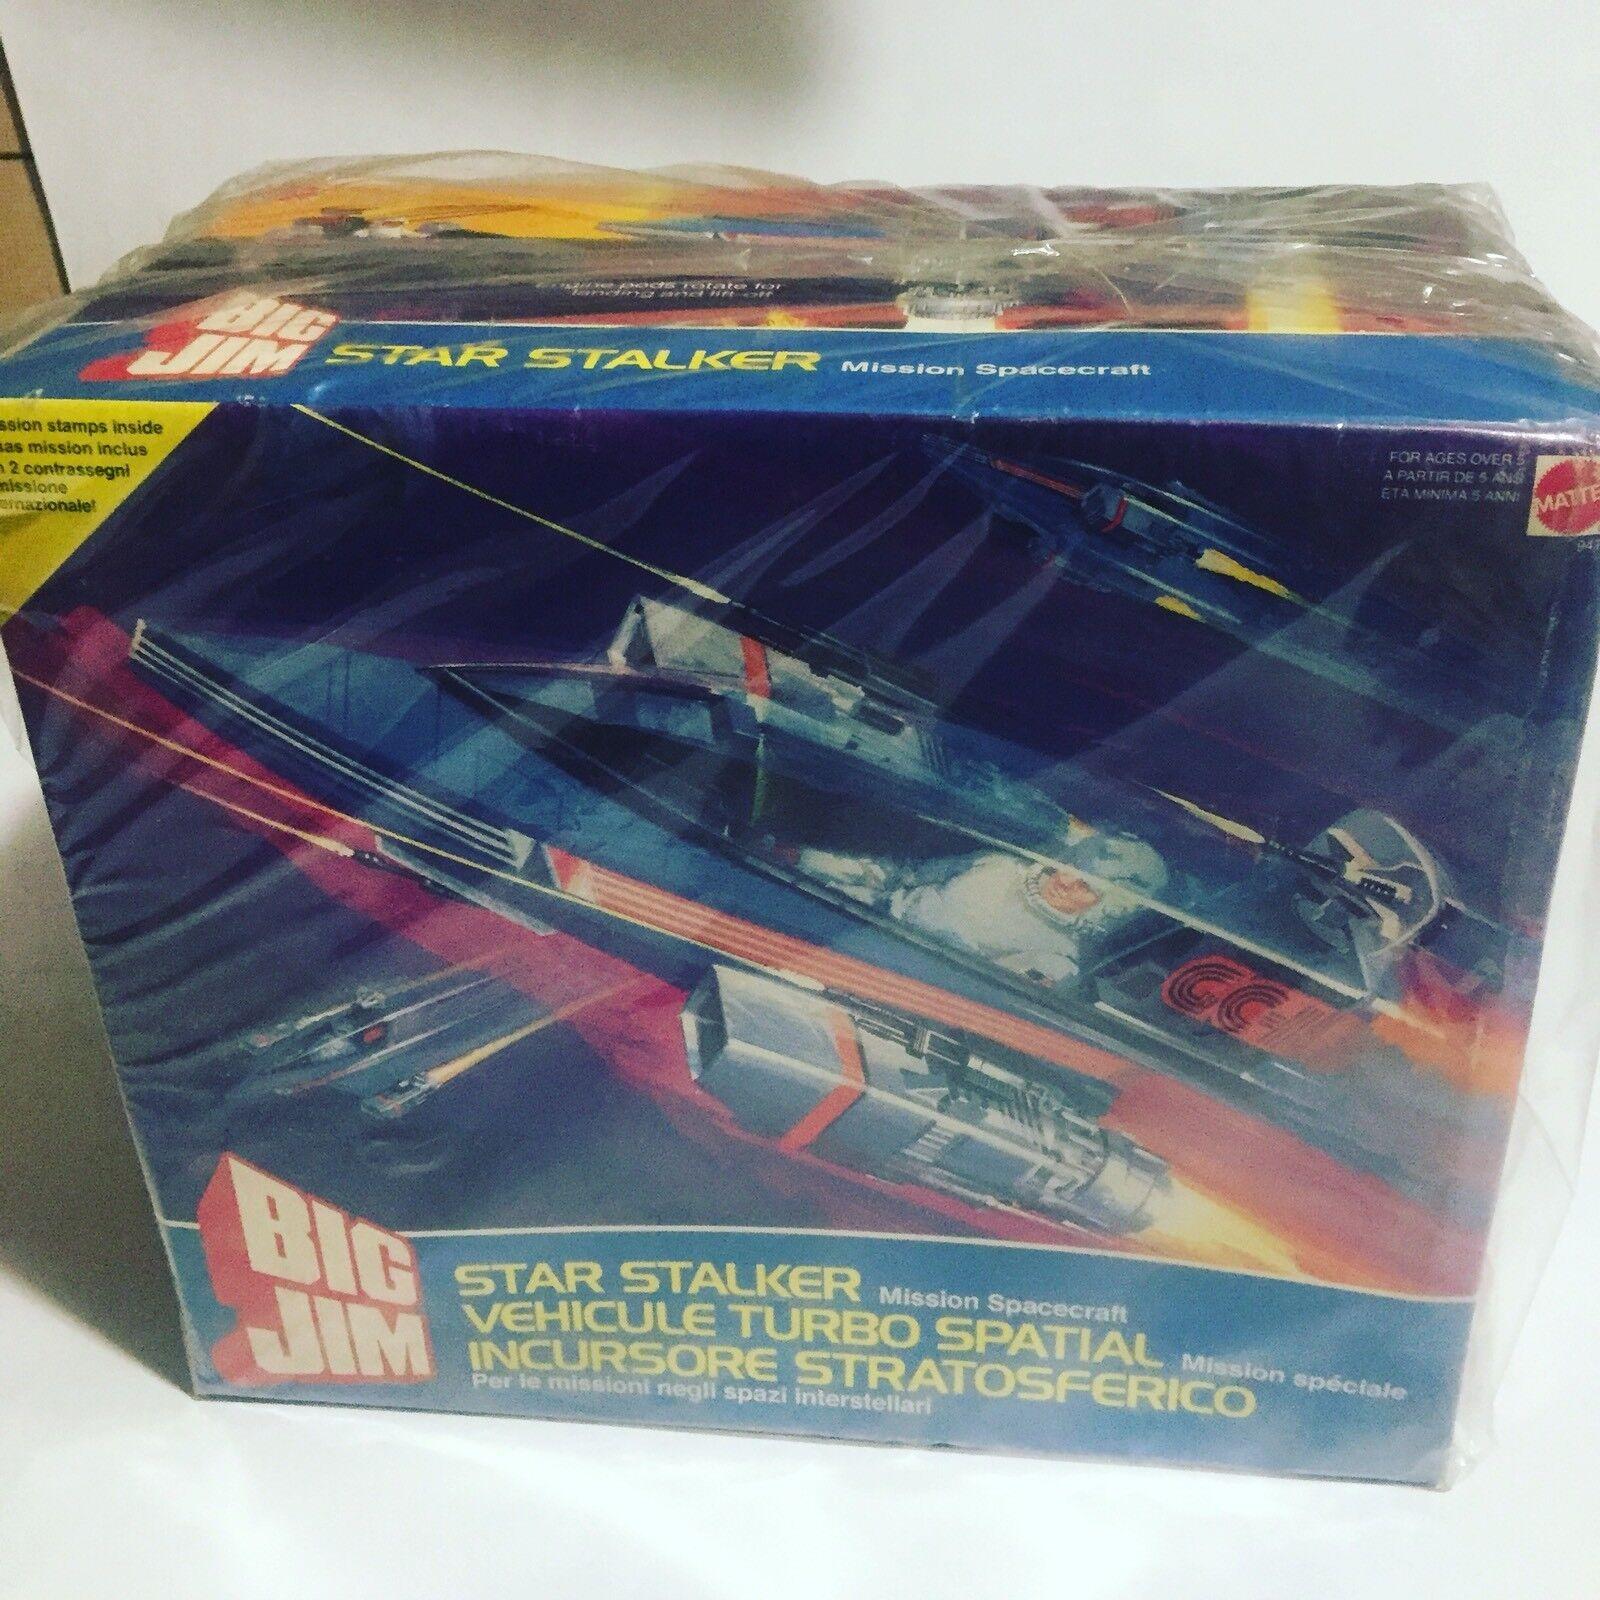 Big Jim Jim Jim Star Stalker Mattel 1986 Veicolo Spaziale 7958a2